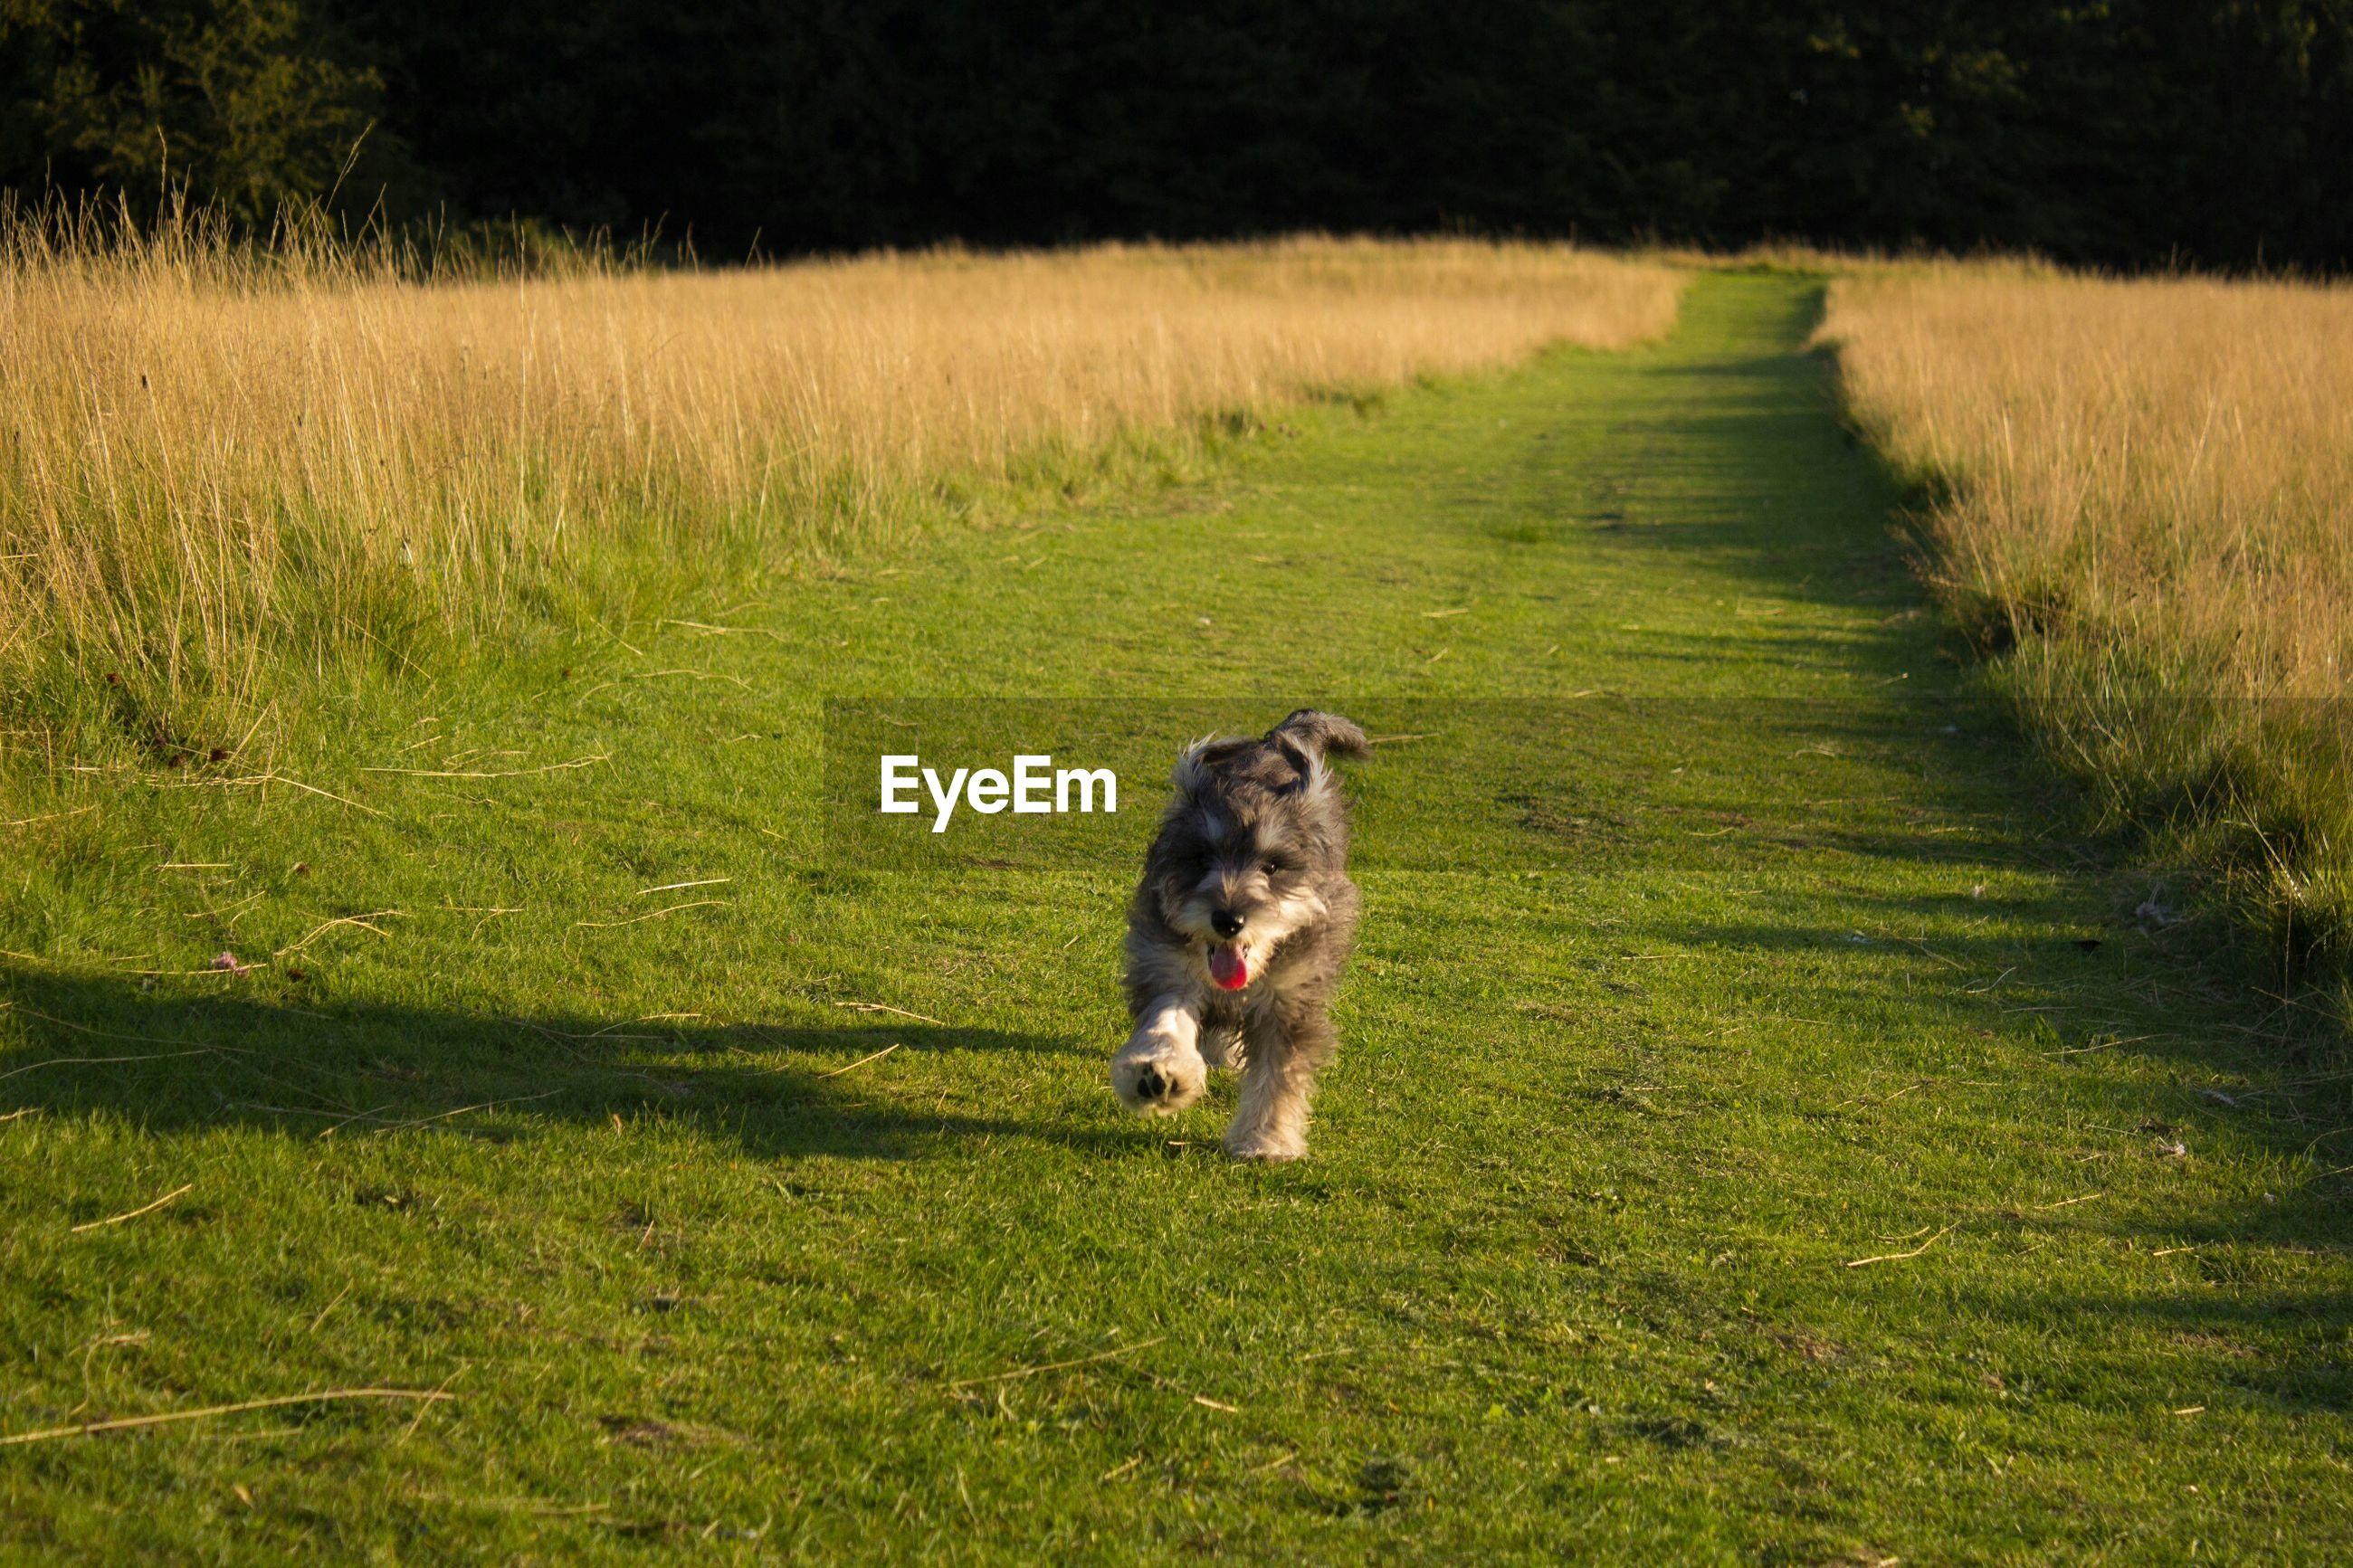 Schnauzer walking on grassy field